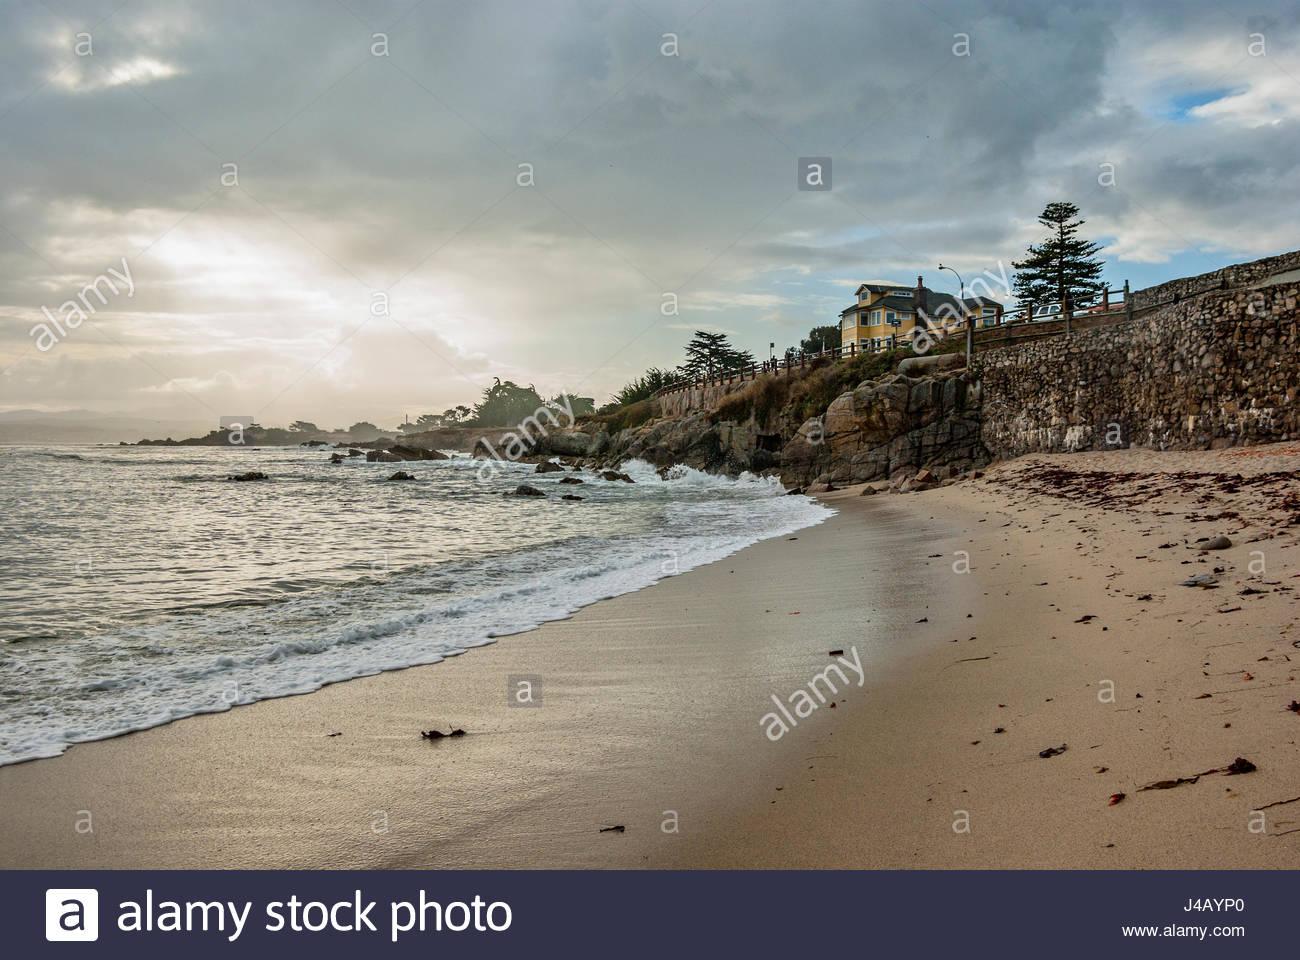 People hike Monterey Peninsula Recreational Trail in Pacific Grove, Calif., Stanford's Hopkins Seaside Laboratory - Stock Image